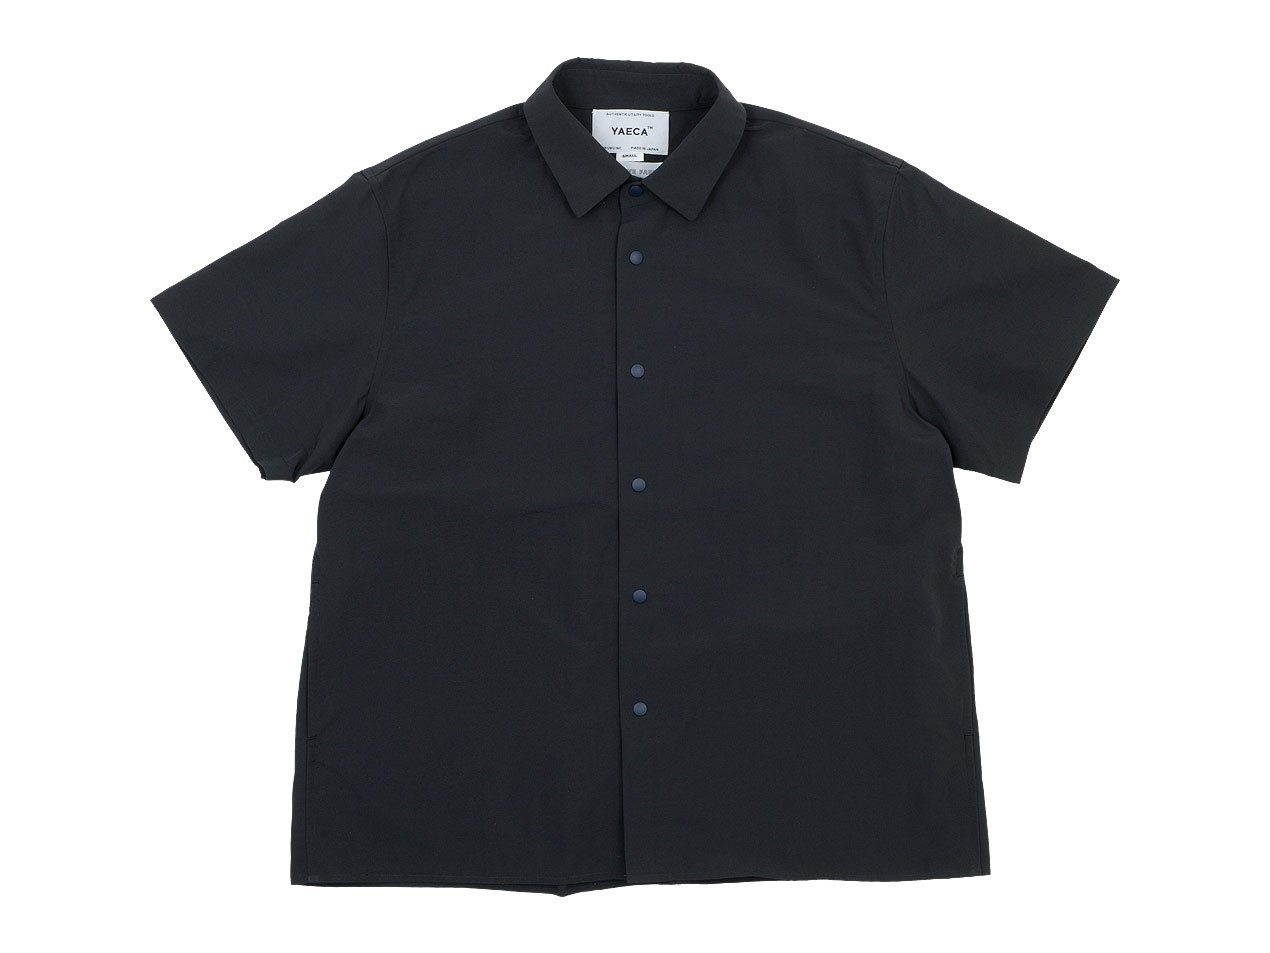 YAECA コンフォートシャツ 半袖 DARK NAVY 〔レディース〕 【69140】